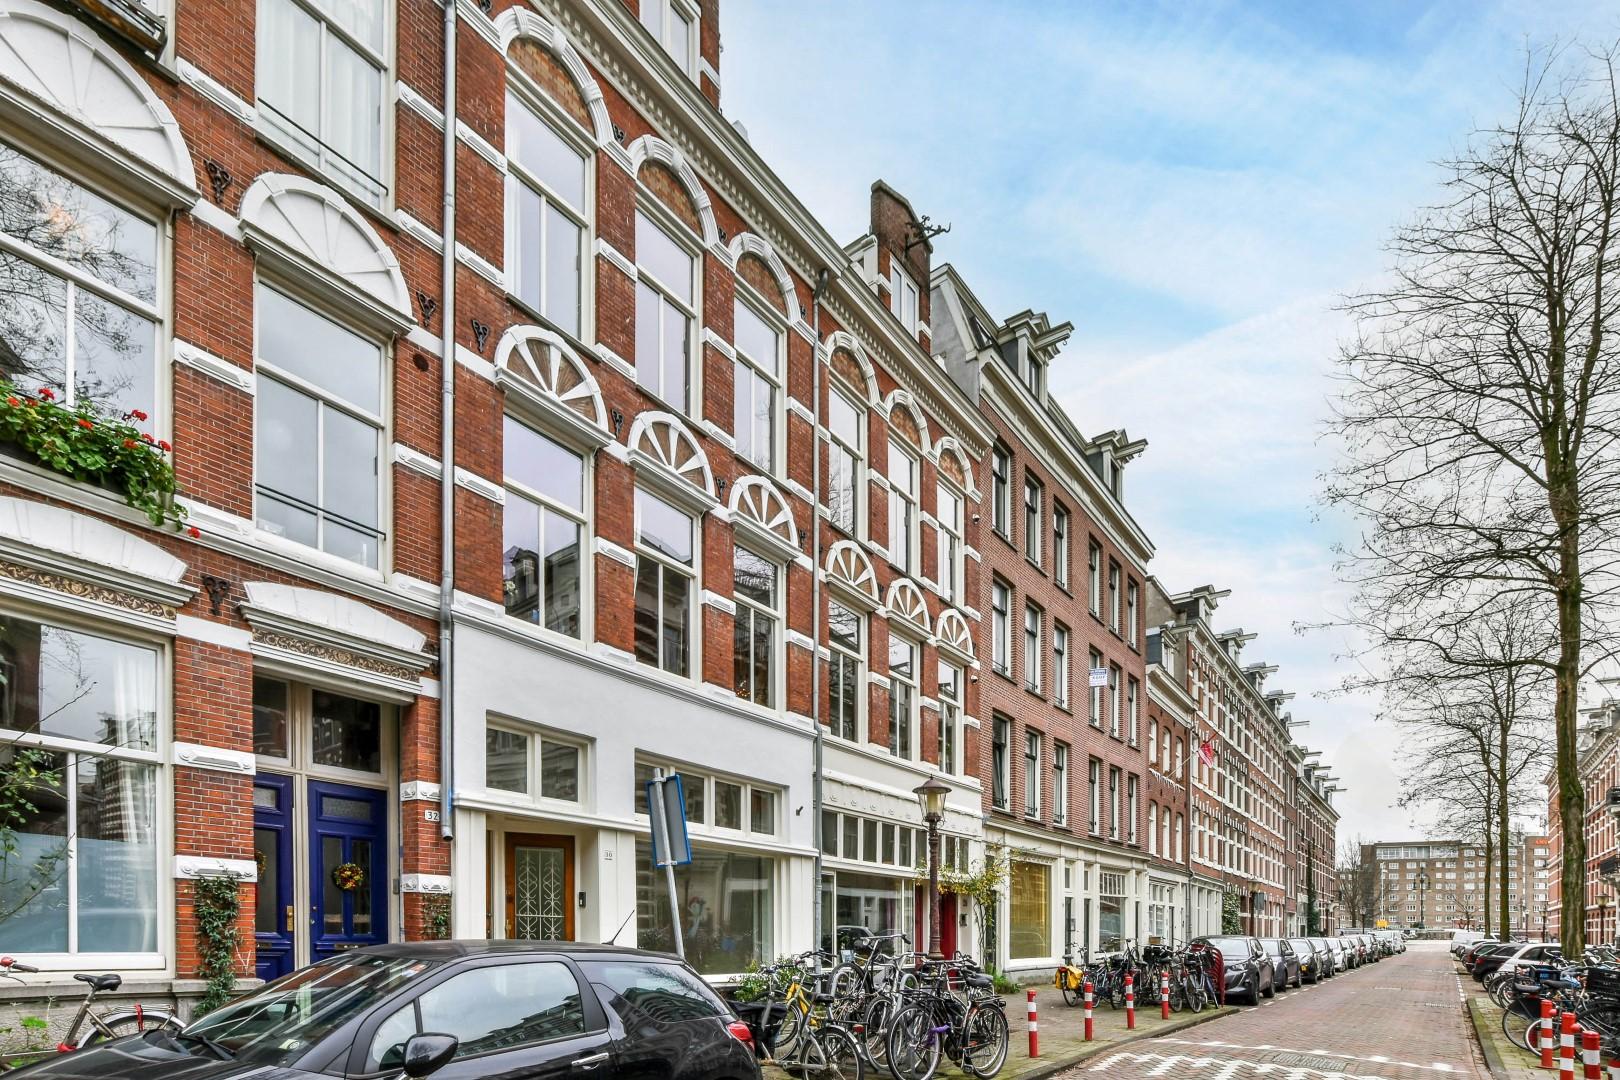 Blasiusstraat 30 III 1091 CS, Amsterdam, Noord-Holland Nederland, 2 Slaapkamers Slaapkamers, ,1 BadkamerBadkamers,Appartement,Huur,Blasiusstraat,3,1523